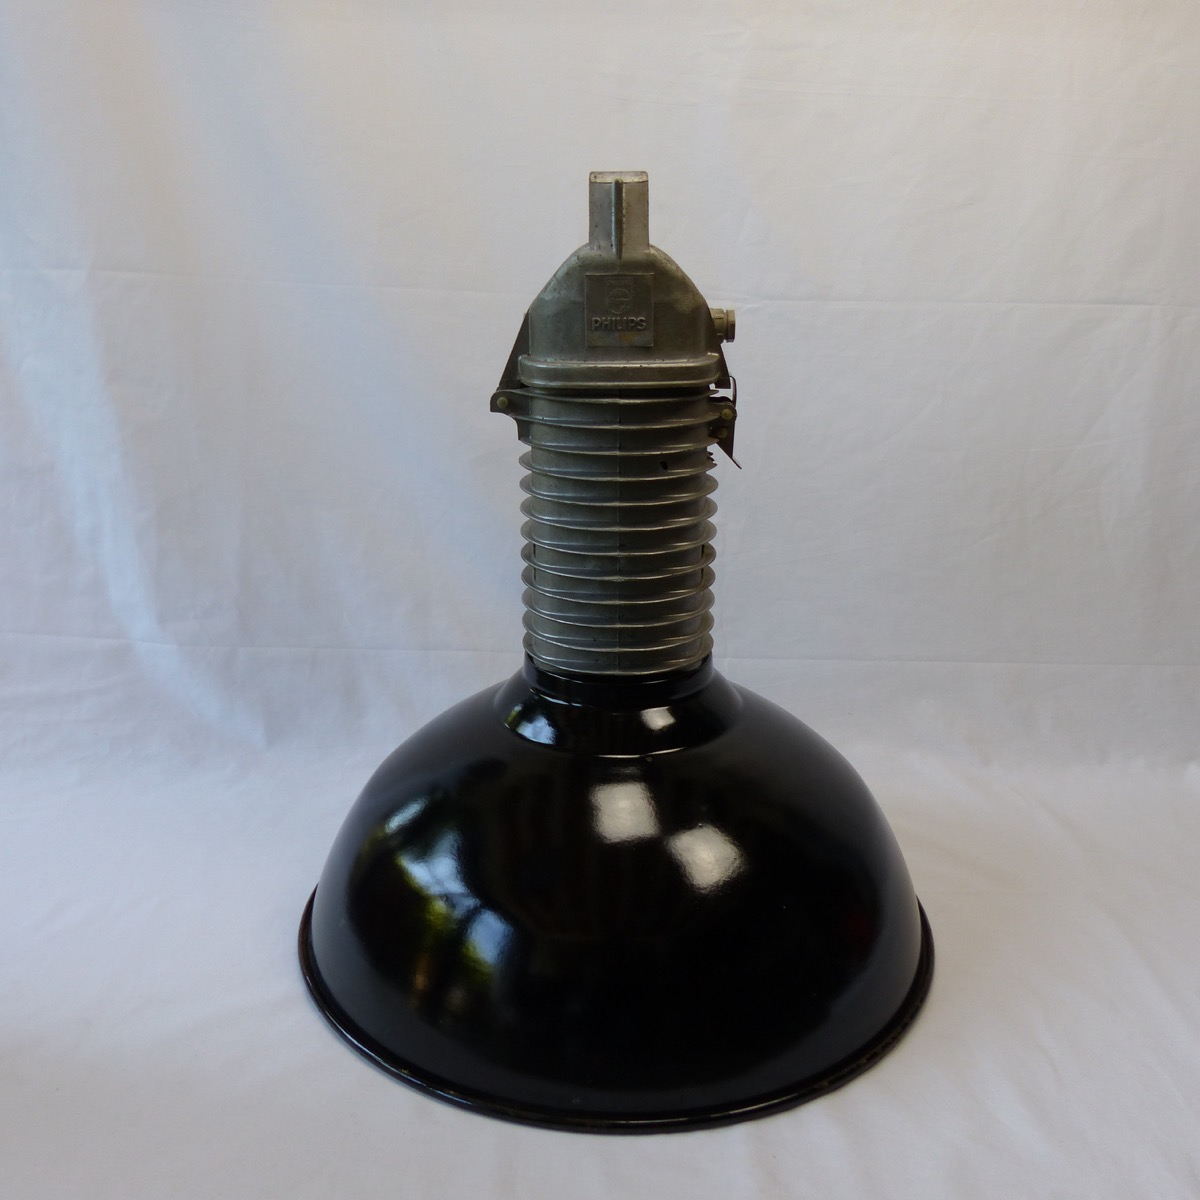 suspension industrielle maill e philips lignedebrocante brocante en ligne chine pour vous. Black Bedroom Furniture Sets. Home Design Ideas